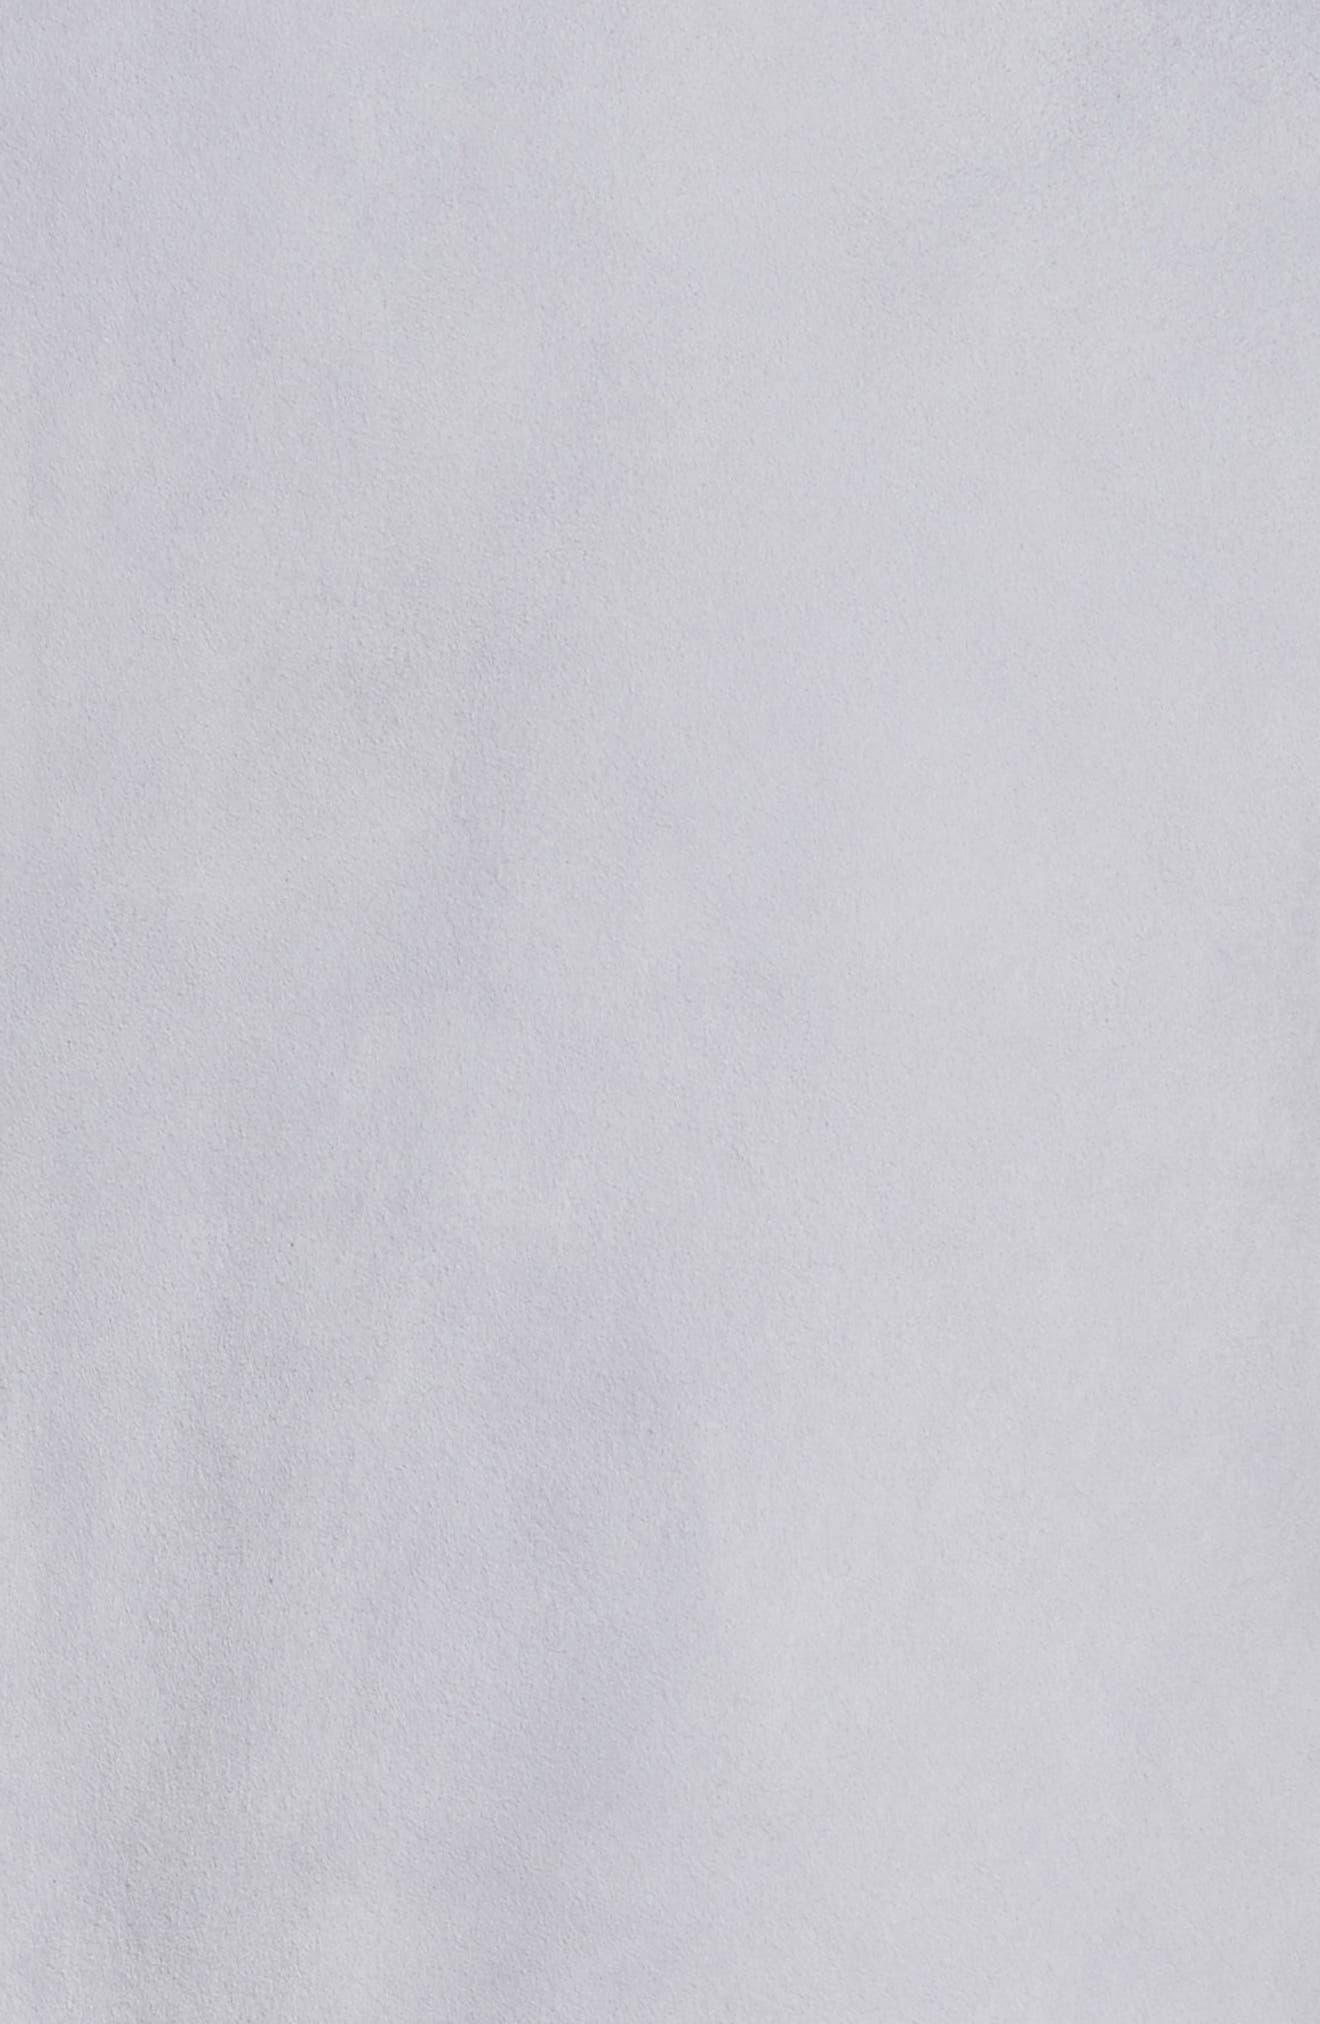 Diane von Furstenberg Patch Pocket Suede Midi Skirt,                             Alternate thumbnail 5, color,                             Smoke